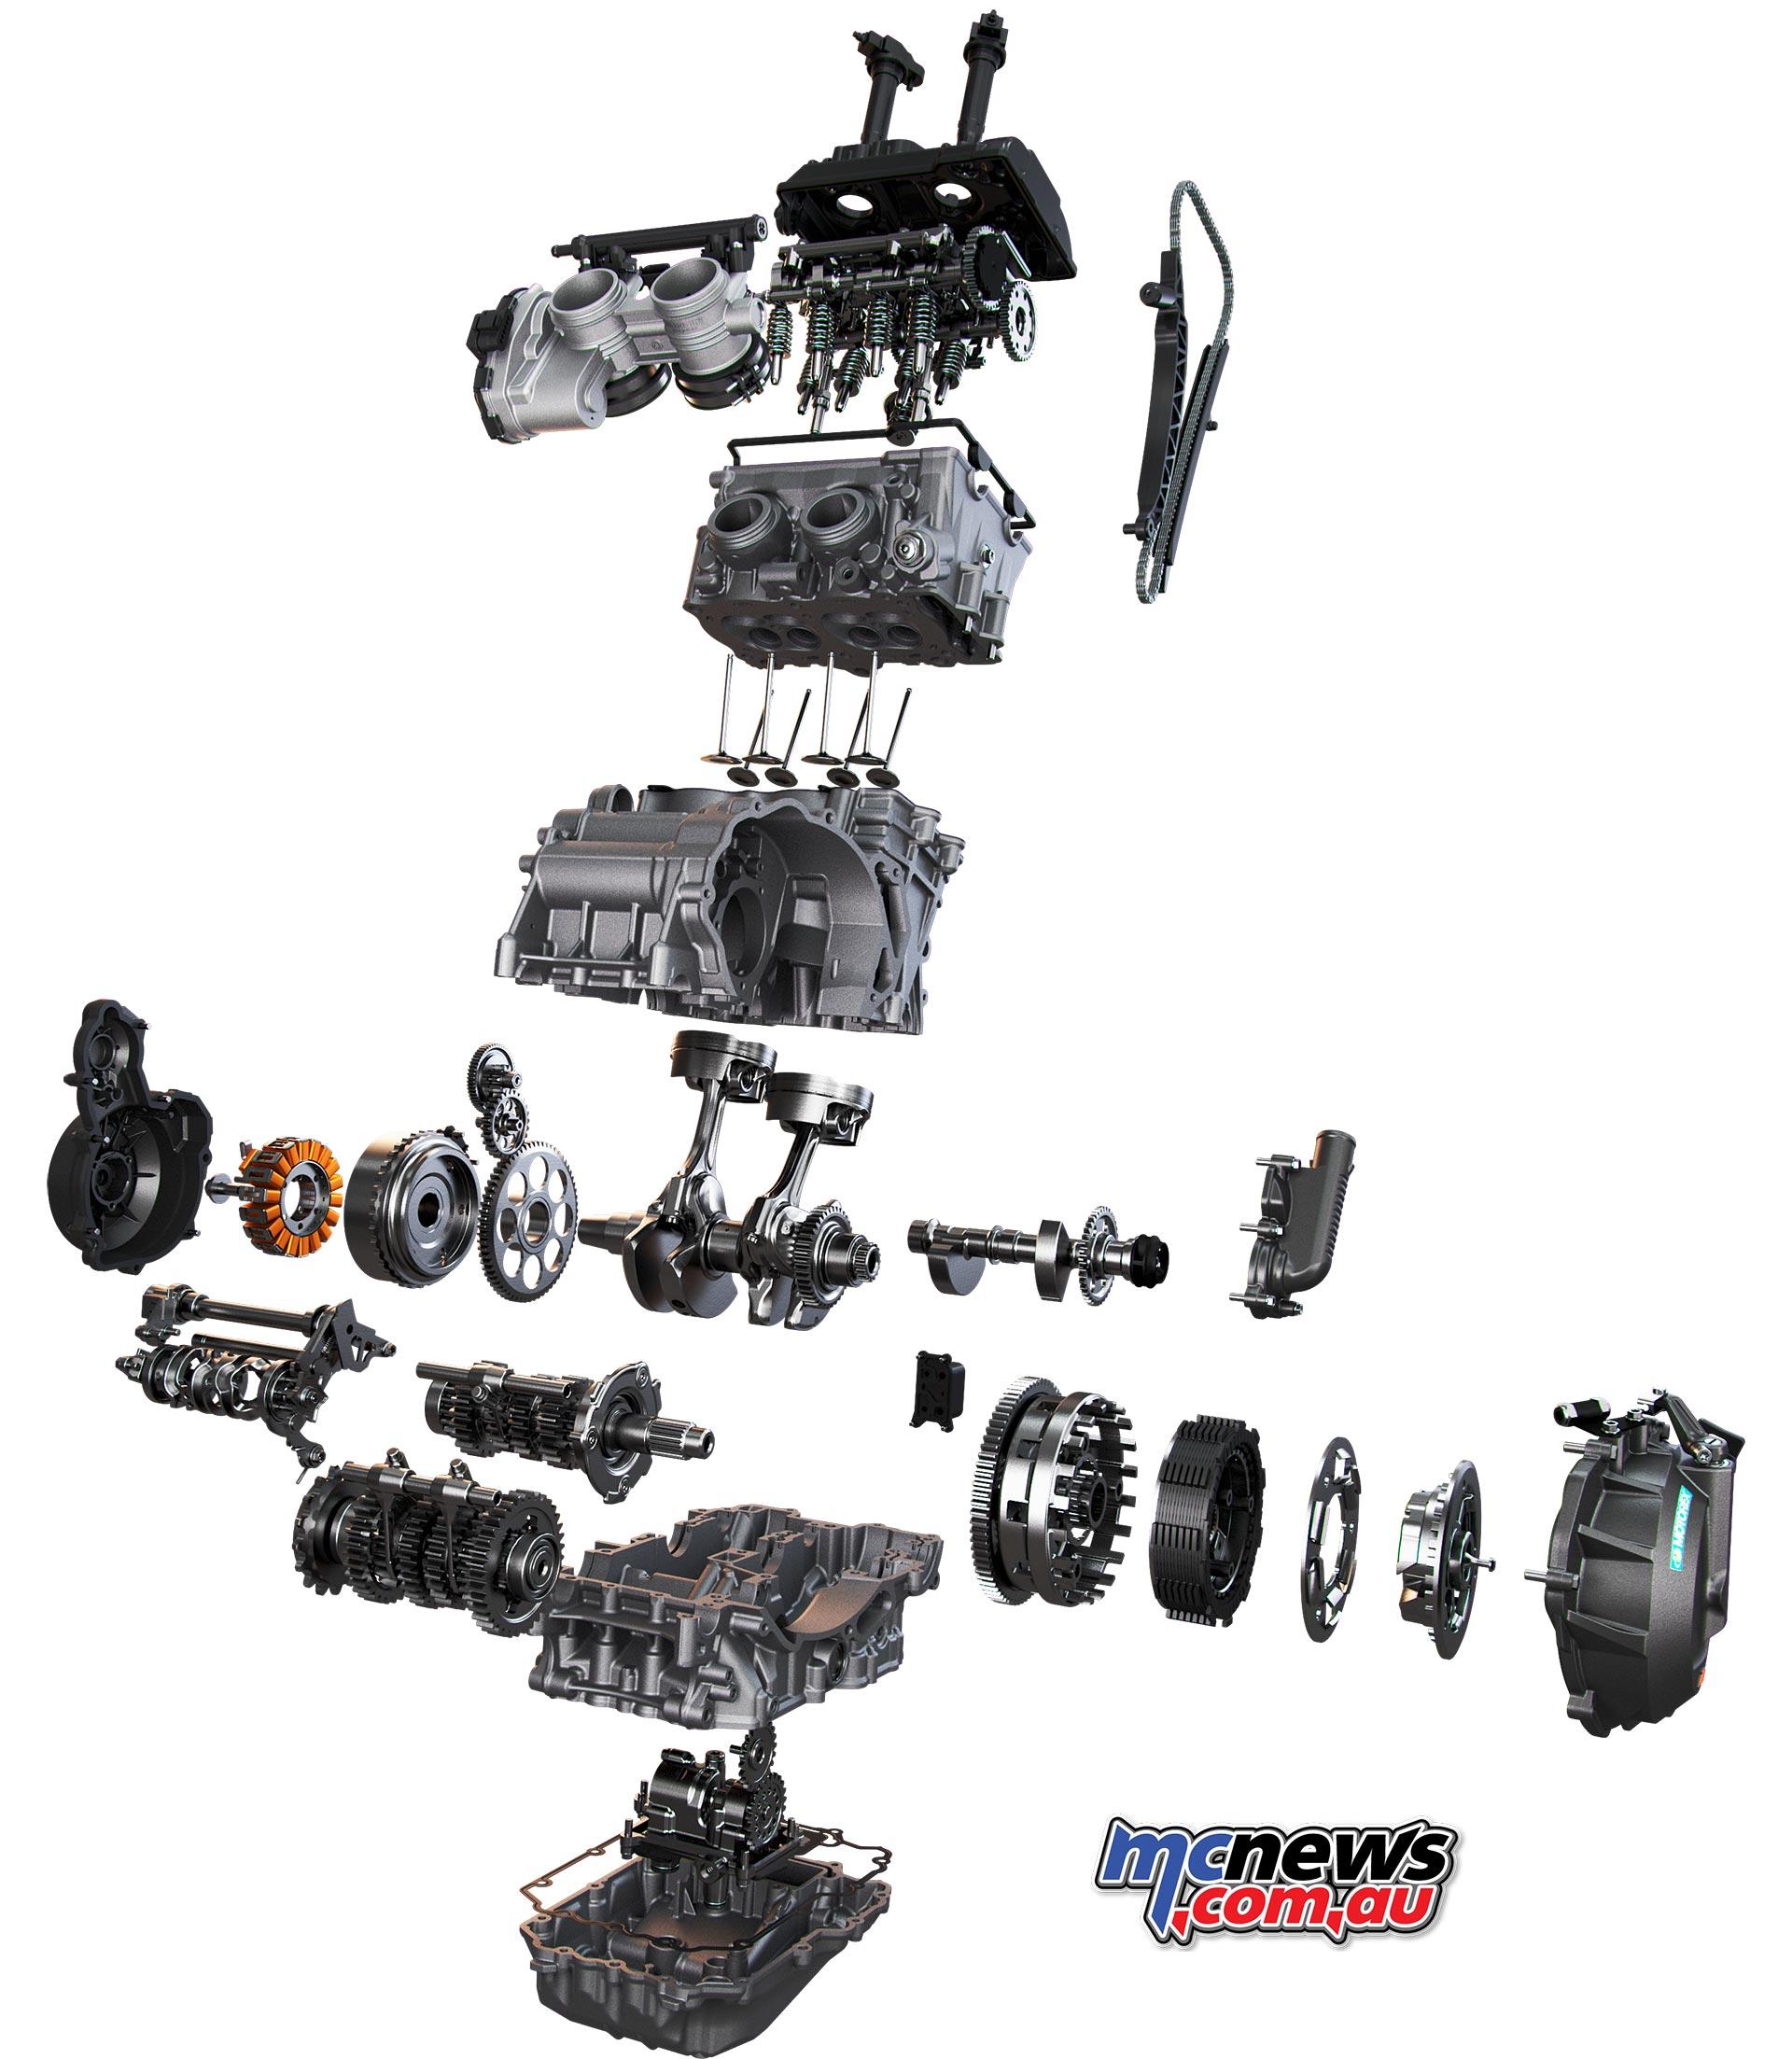 KTM 790 Duke Motorcycle Review